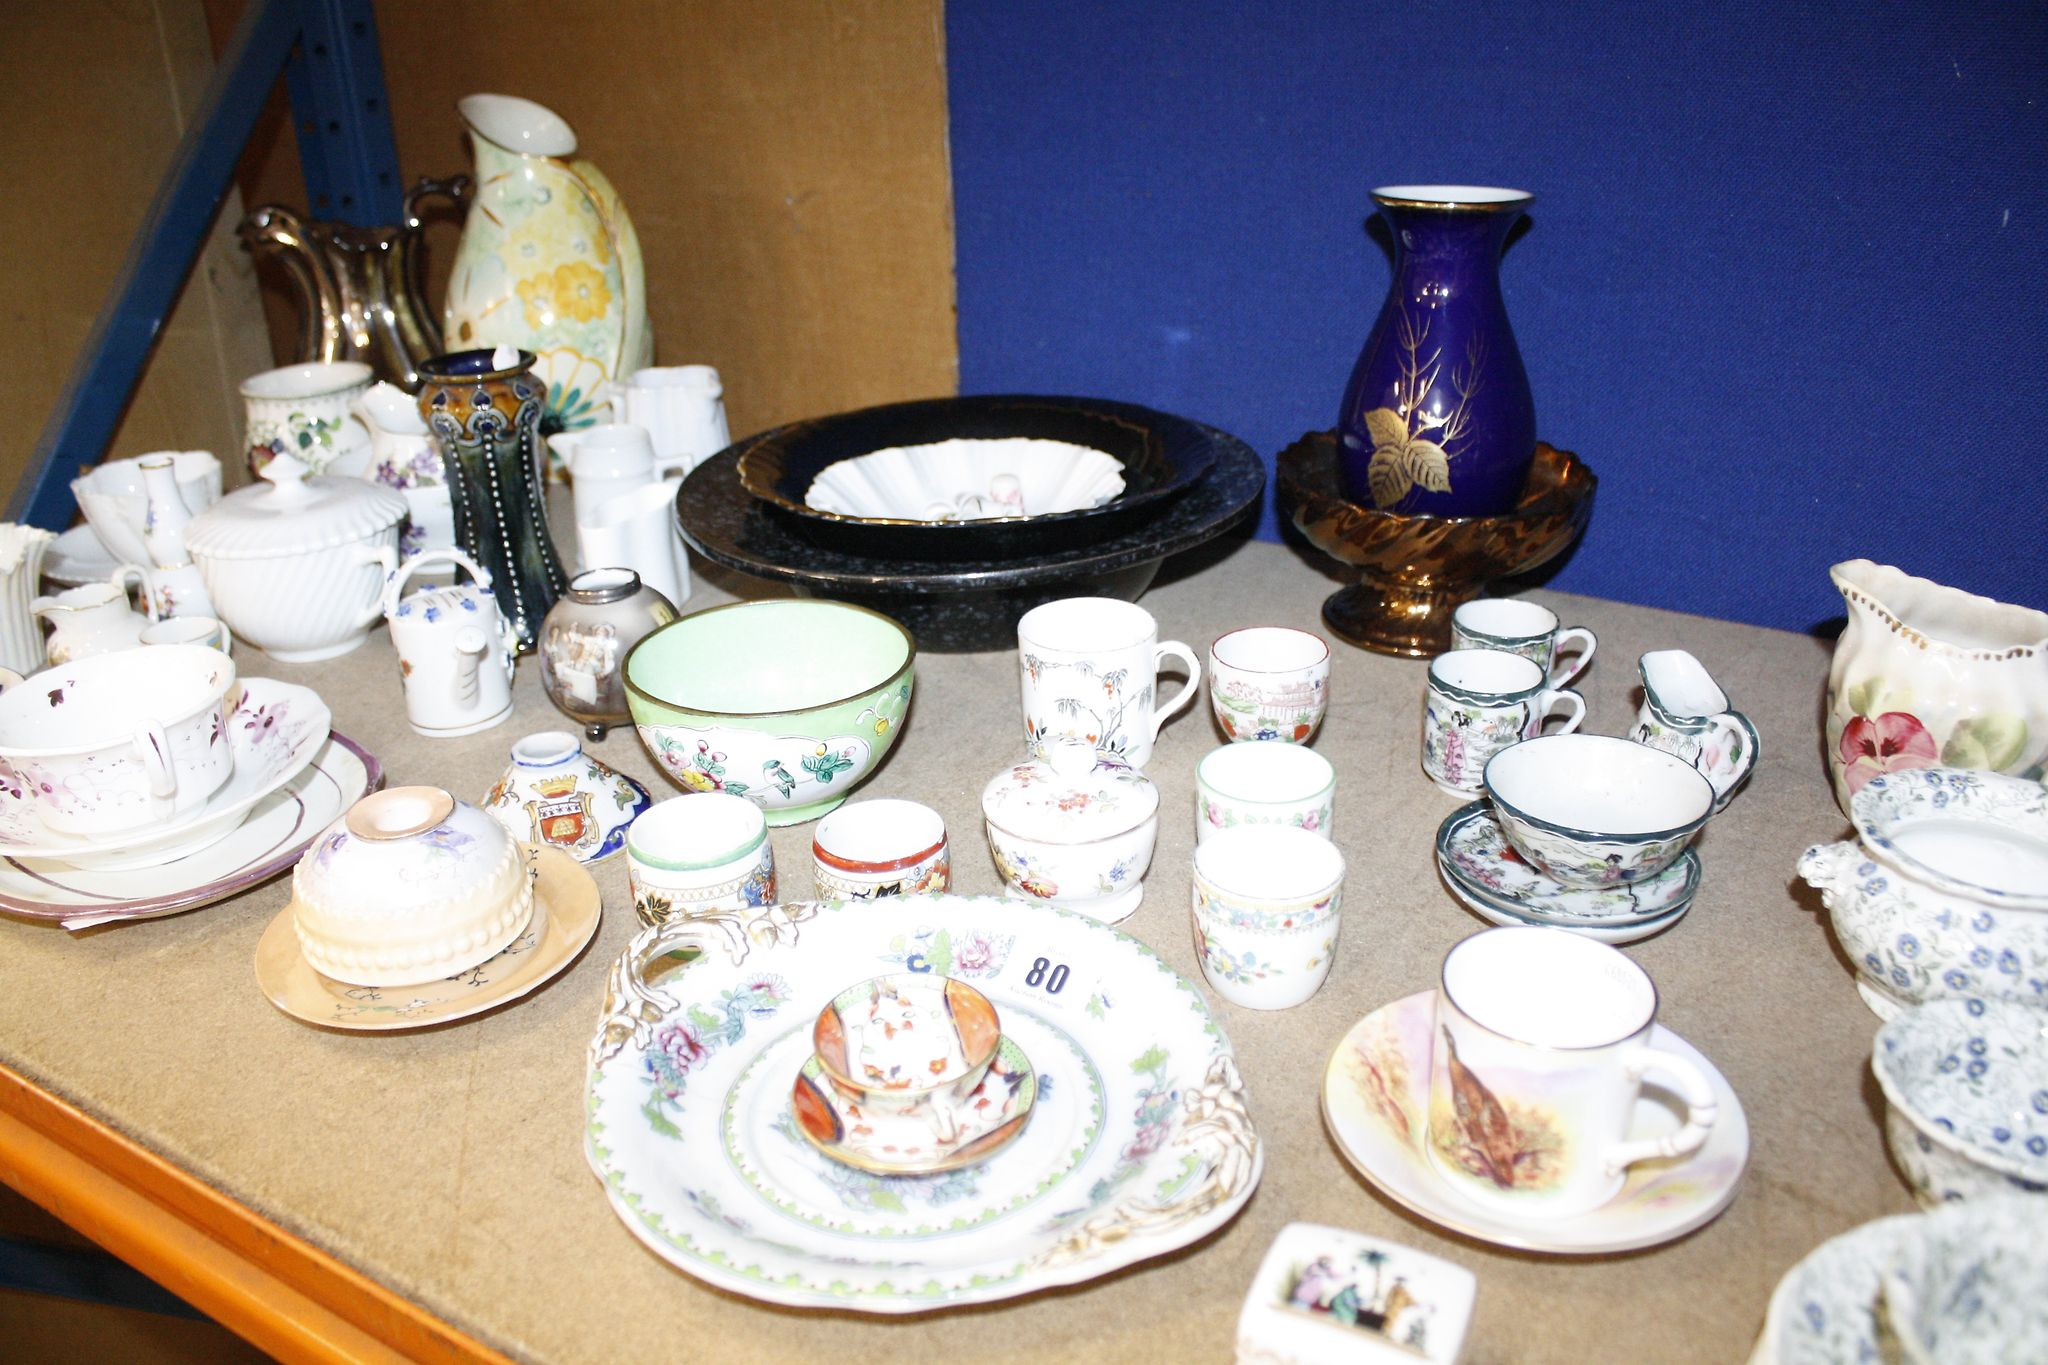 A quantity of decorative ceramics and glassware